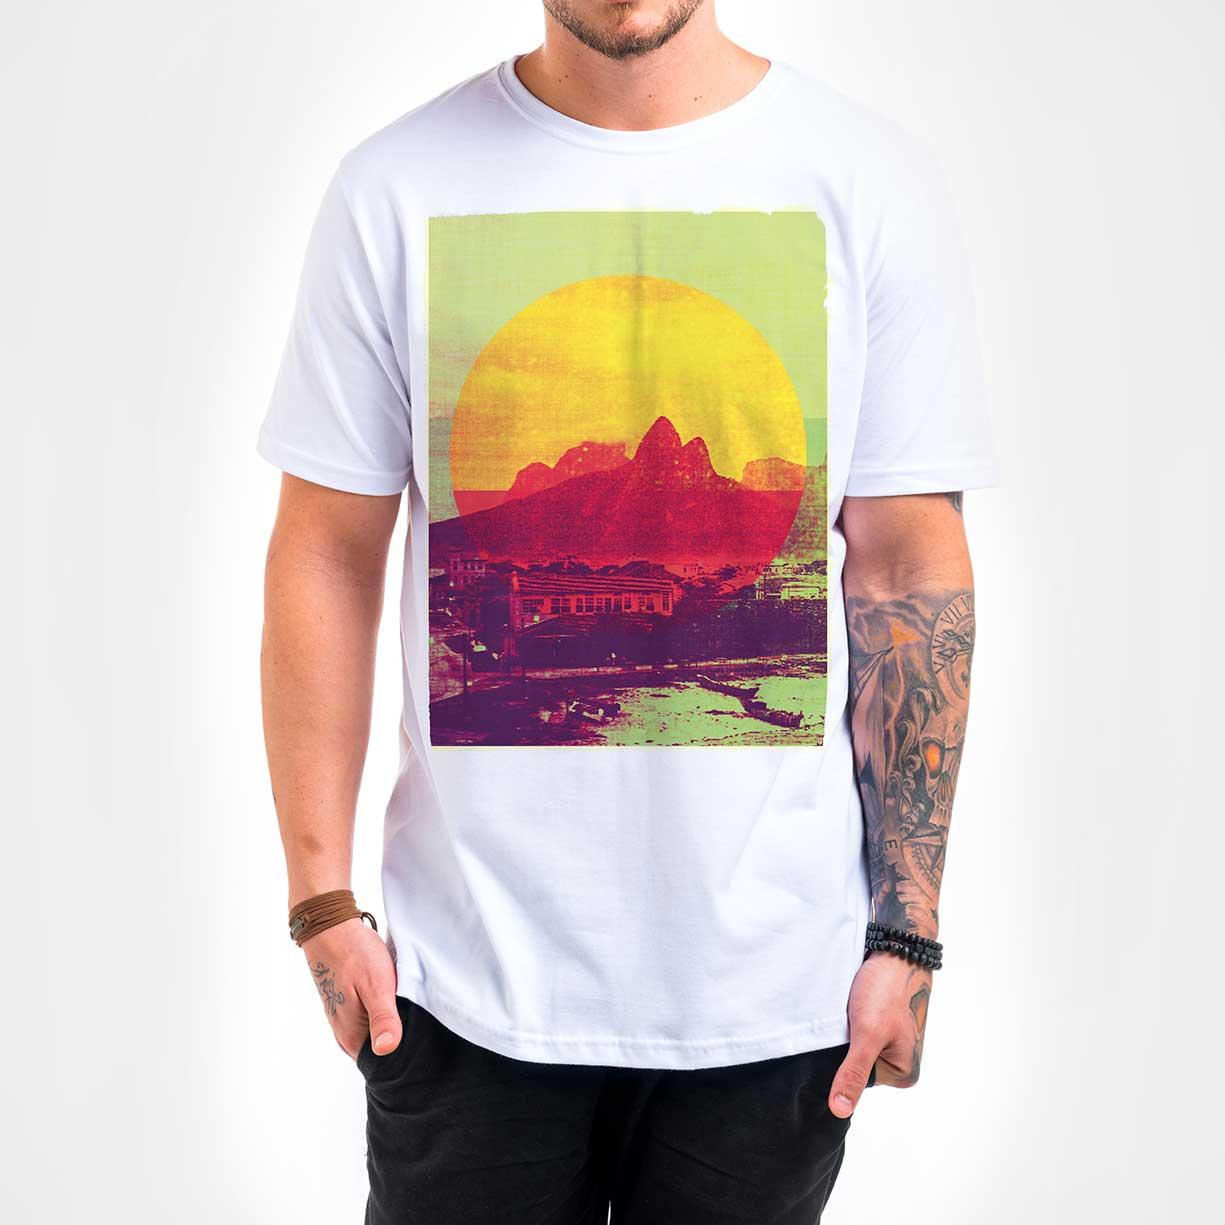 Camisa Masculina - Rio Vintage Sun